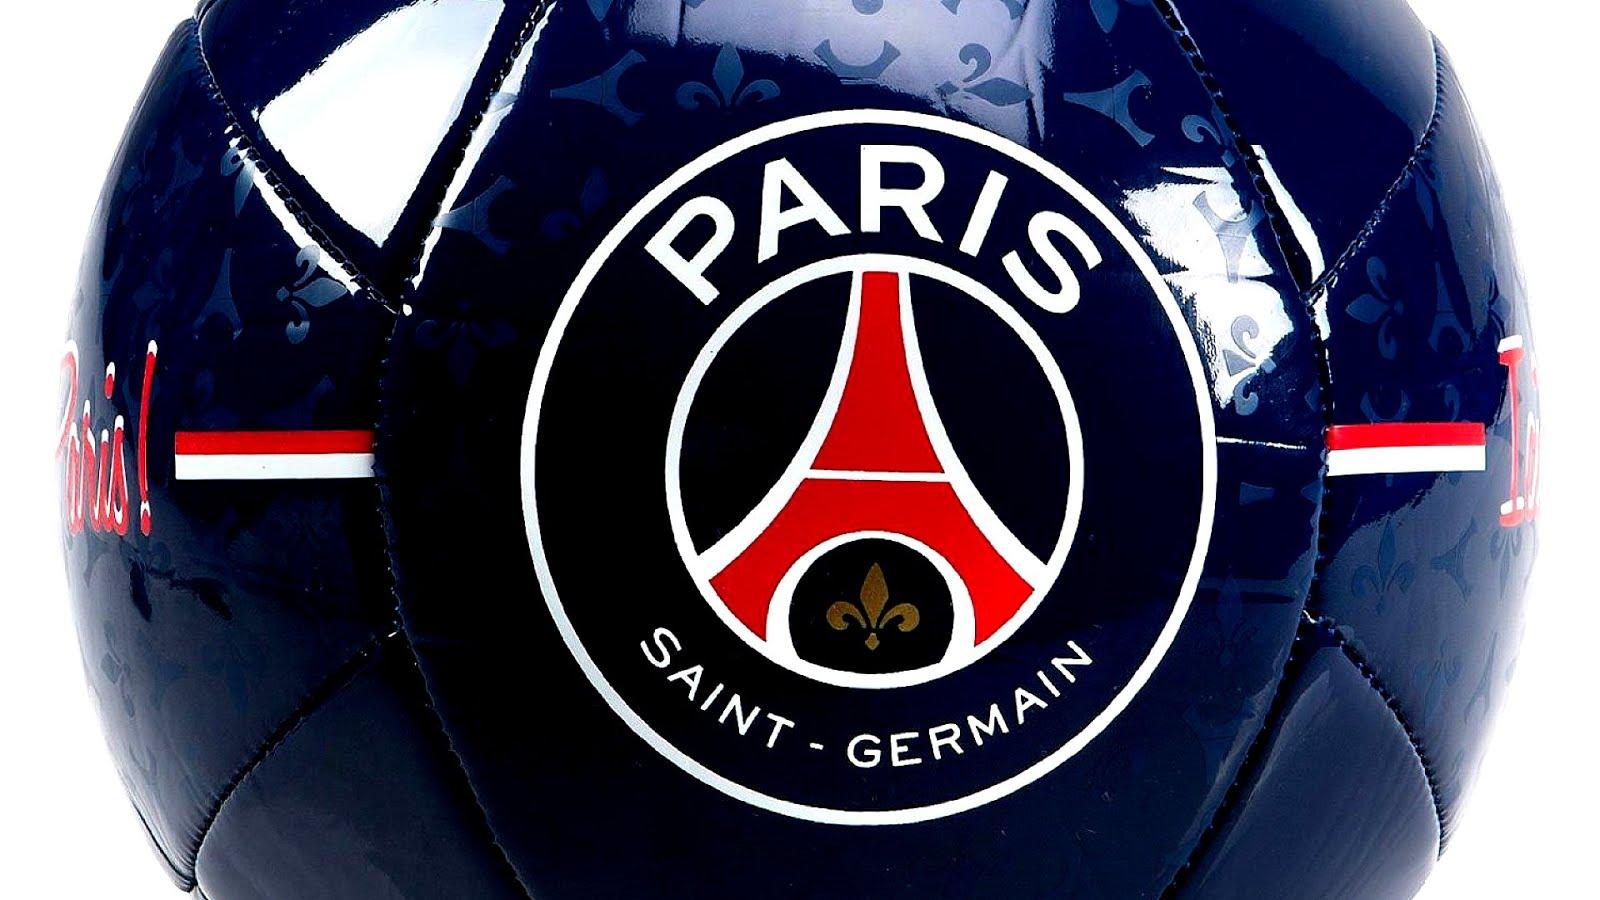 St Germain Paris